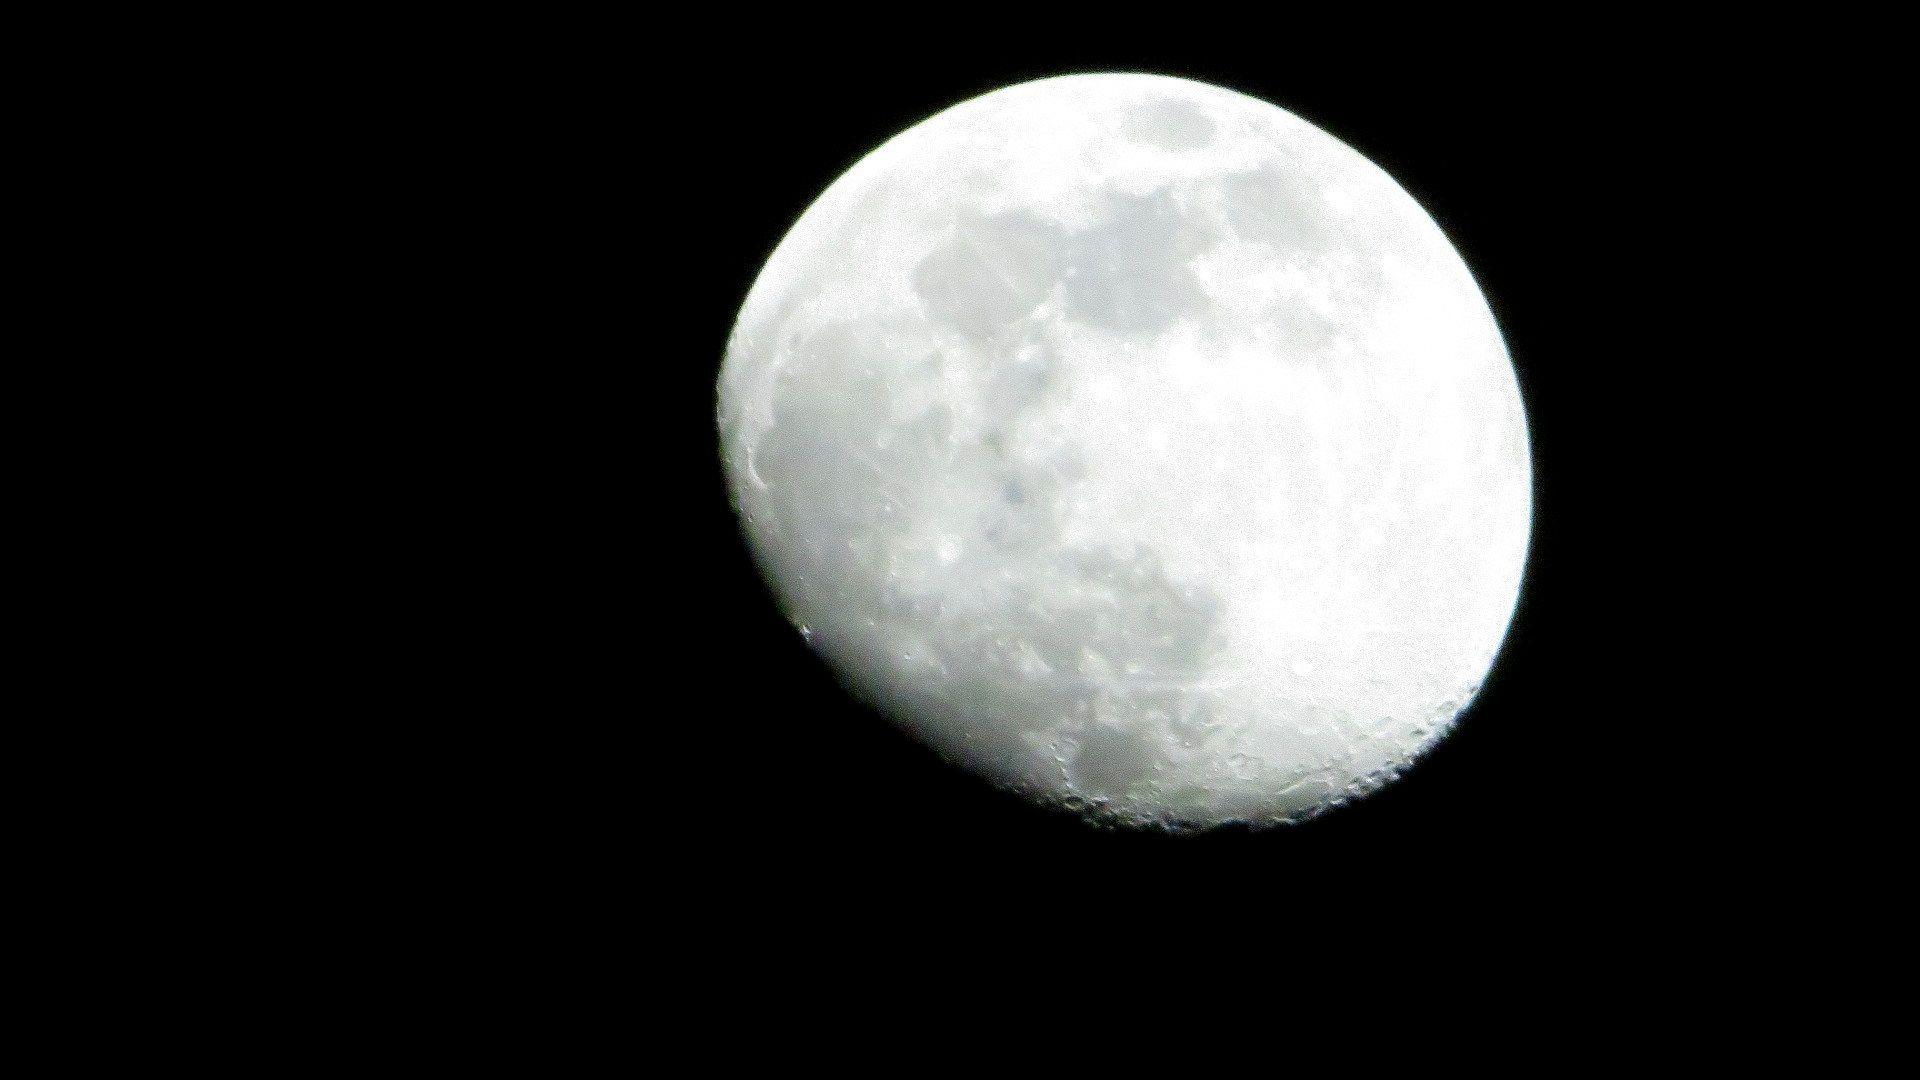 Nuestra Luna (260x) - Canon PowerShot SX60 HS